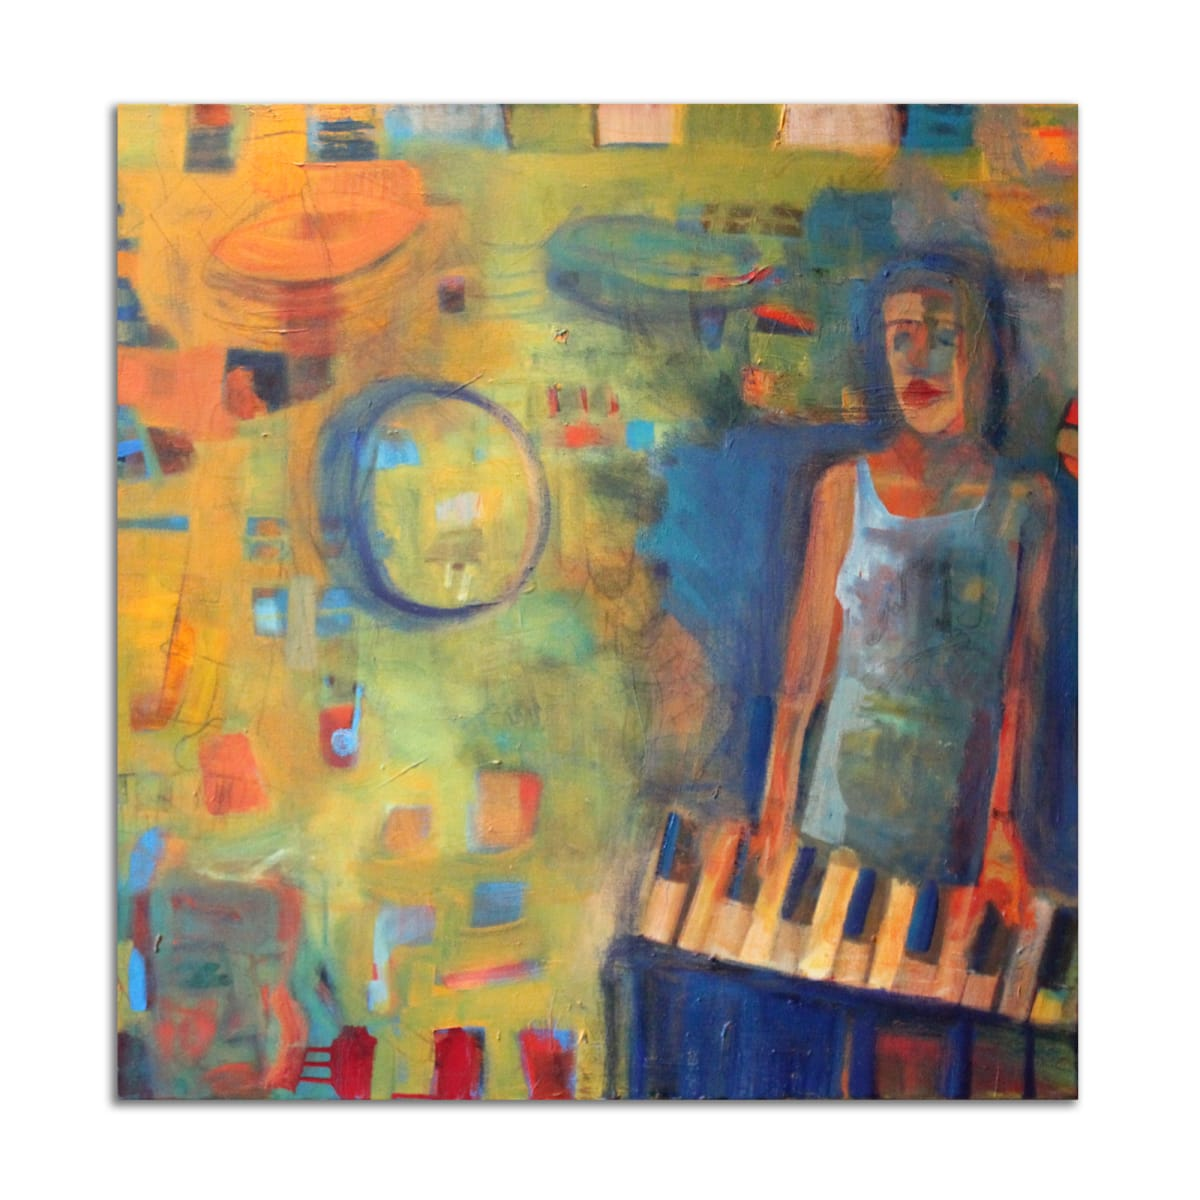 Jazz Blue by Stephanie Cramer